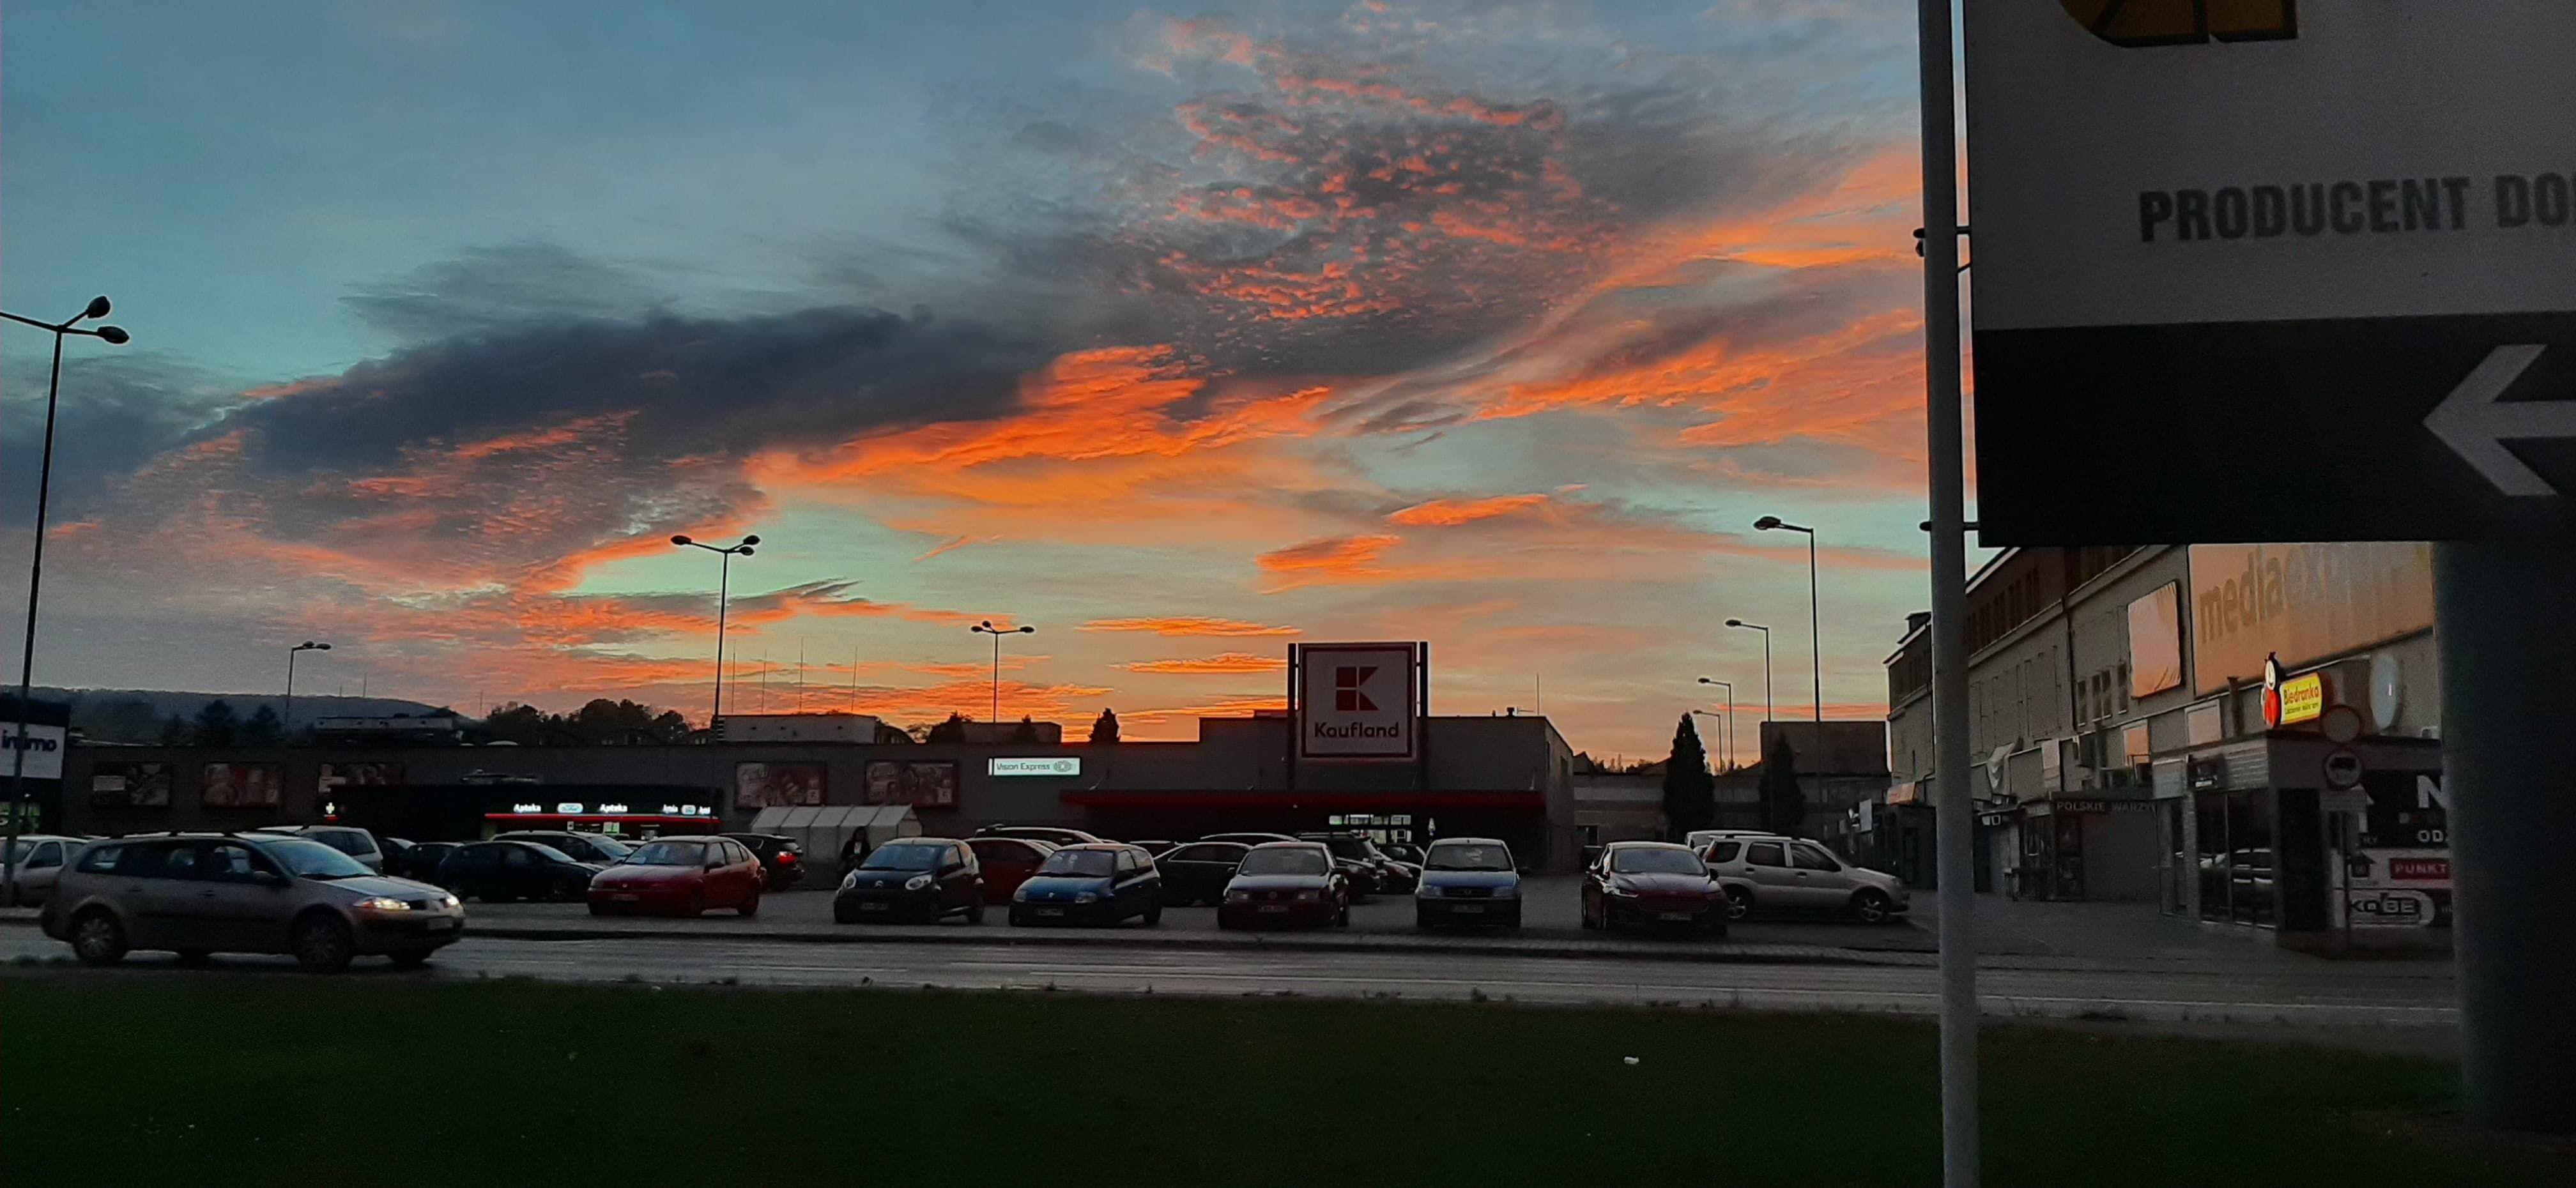 Piękny zachód słońca nad Andrychowem [FOTO]